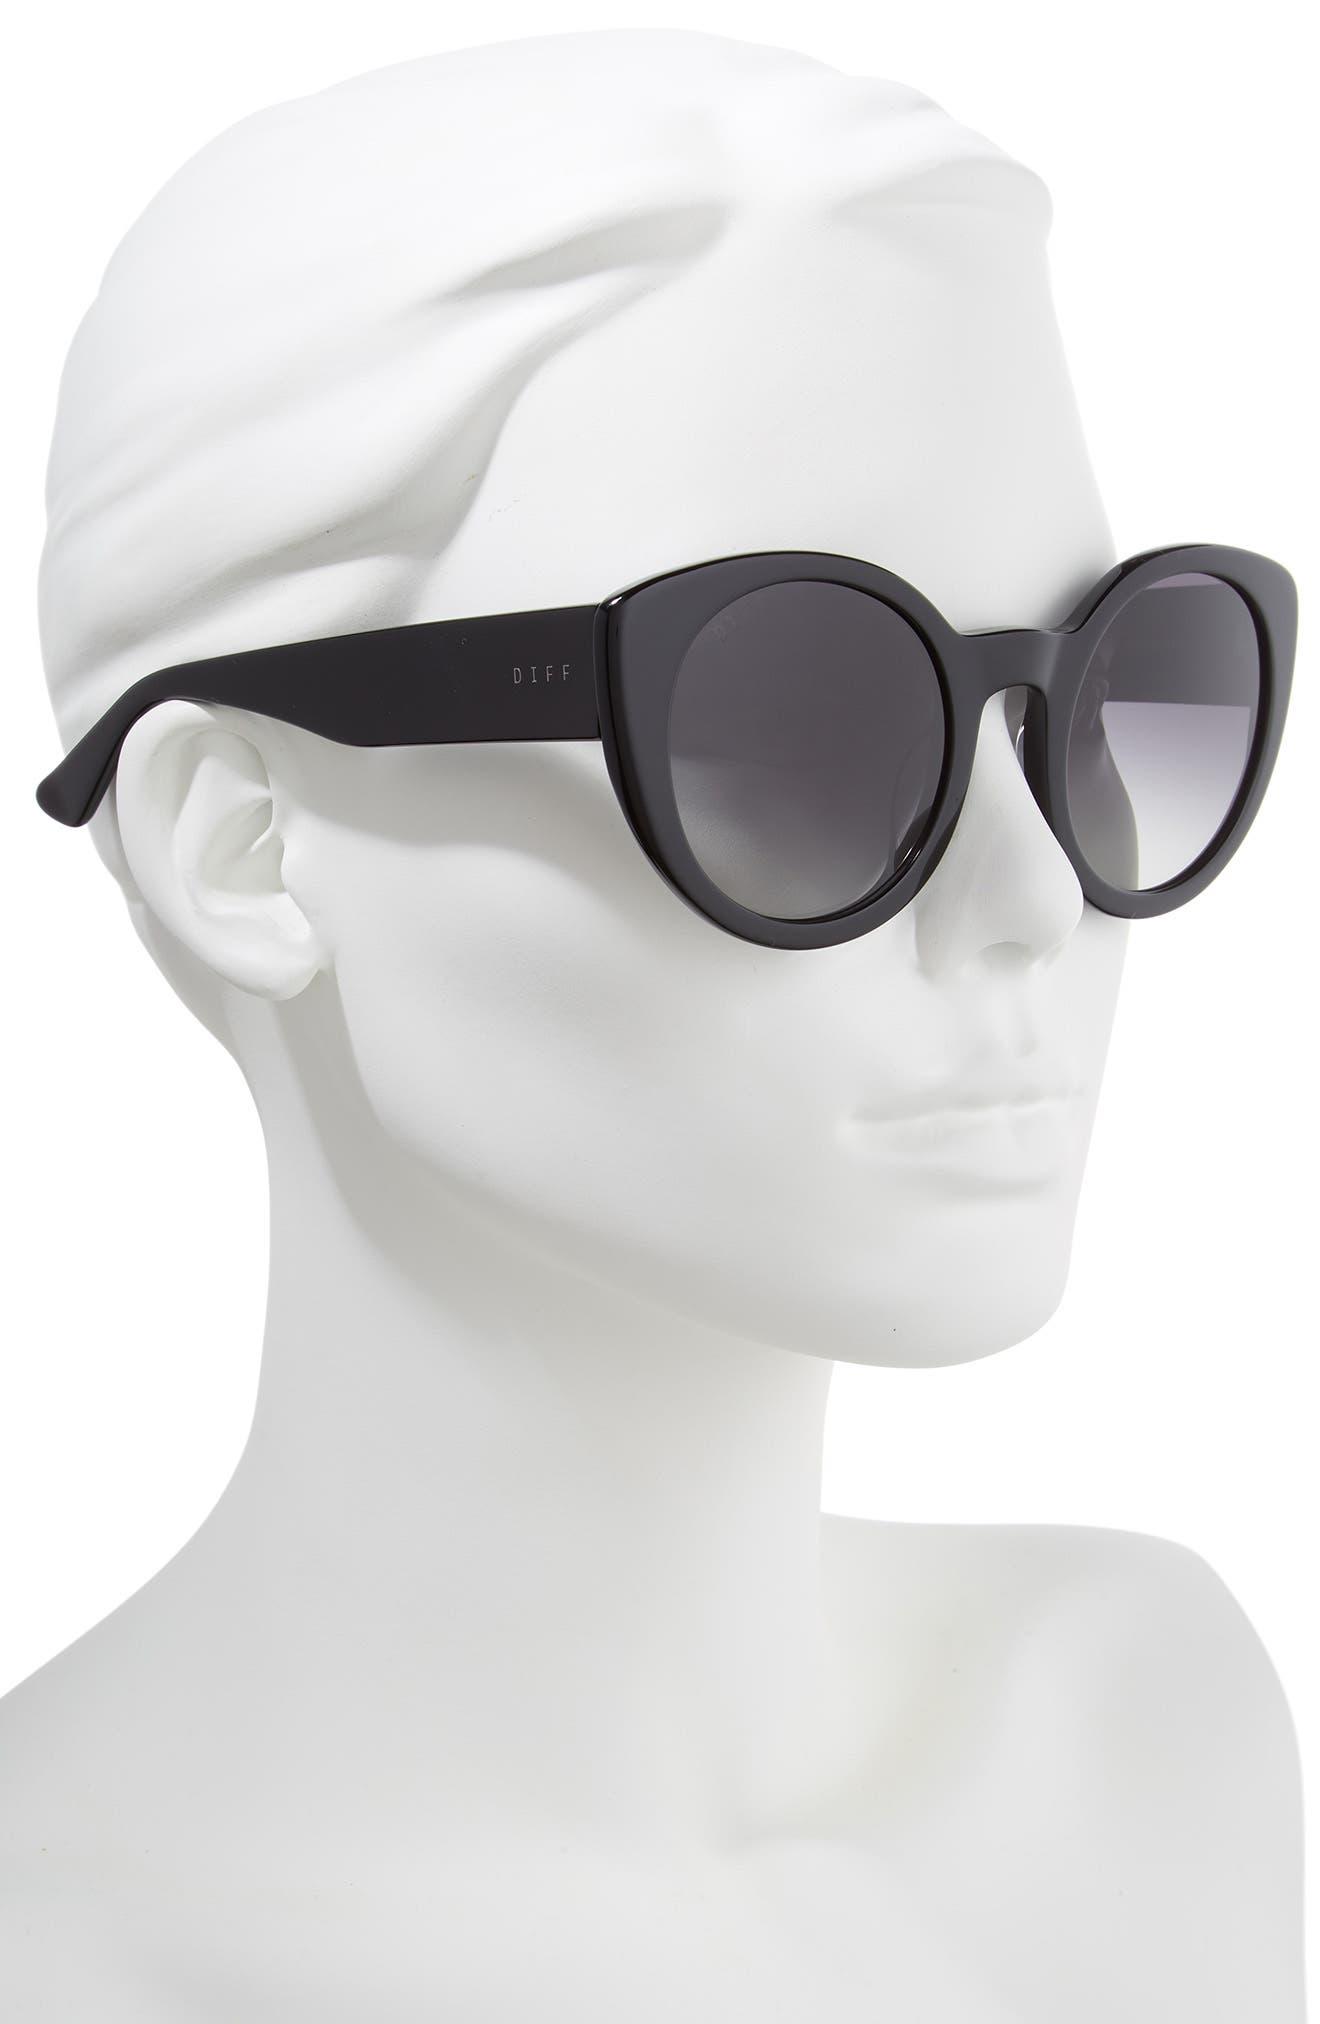 Luna 54mm Polarized Round Sunglasses,                             Alternate thumbnail 2, color,                             BLACK/ GREY